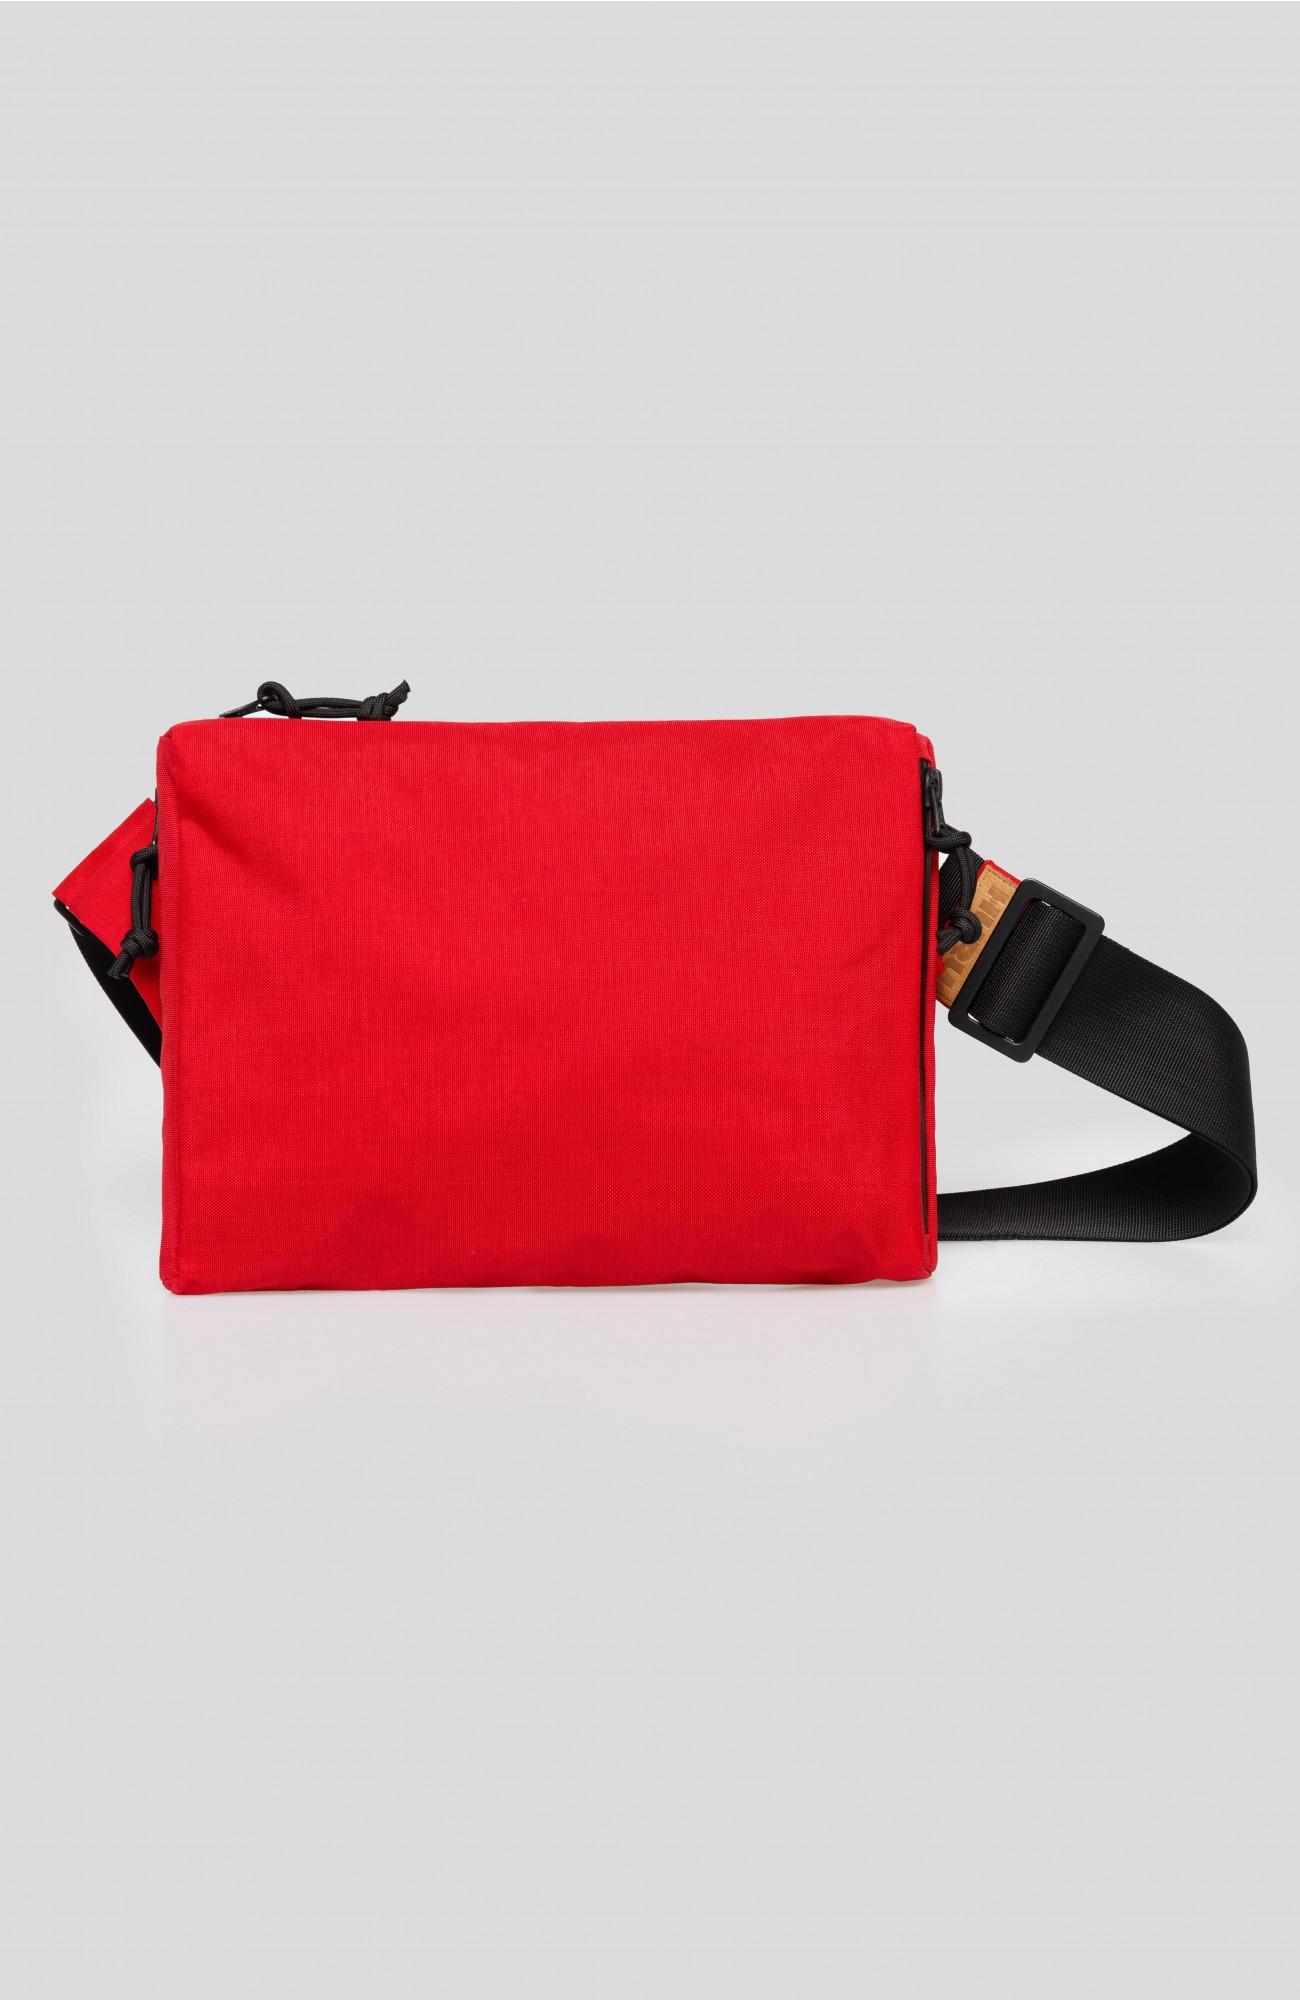 Messenger HURU, red